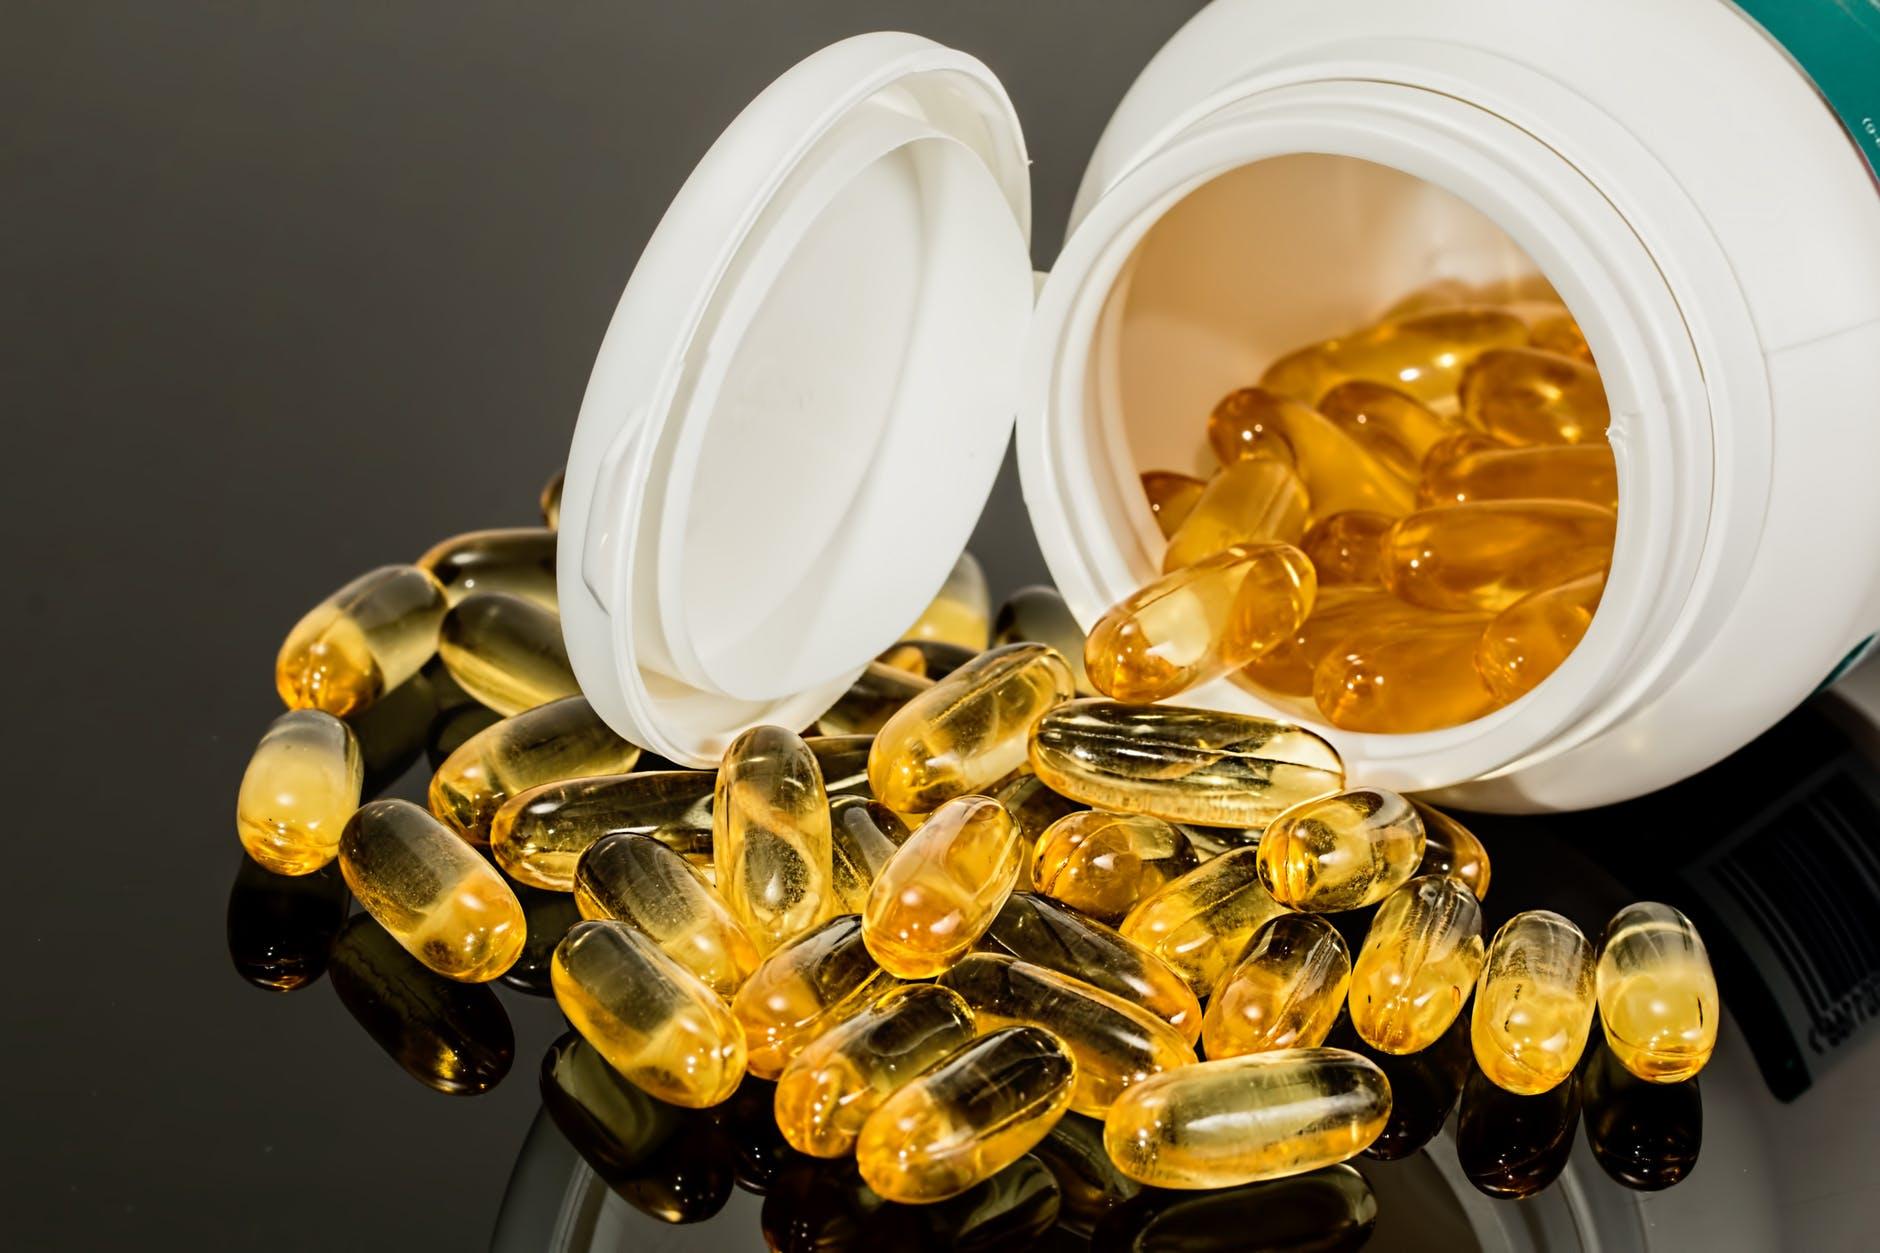 capsule-pill-health-medicine.jpg